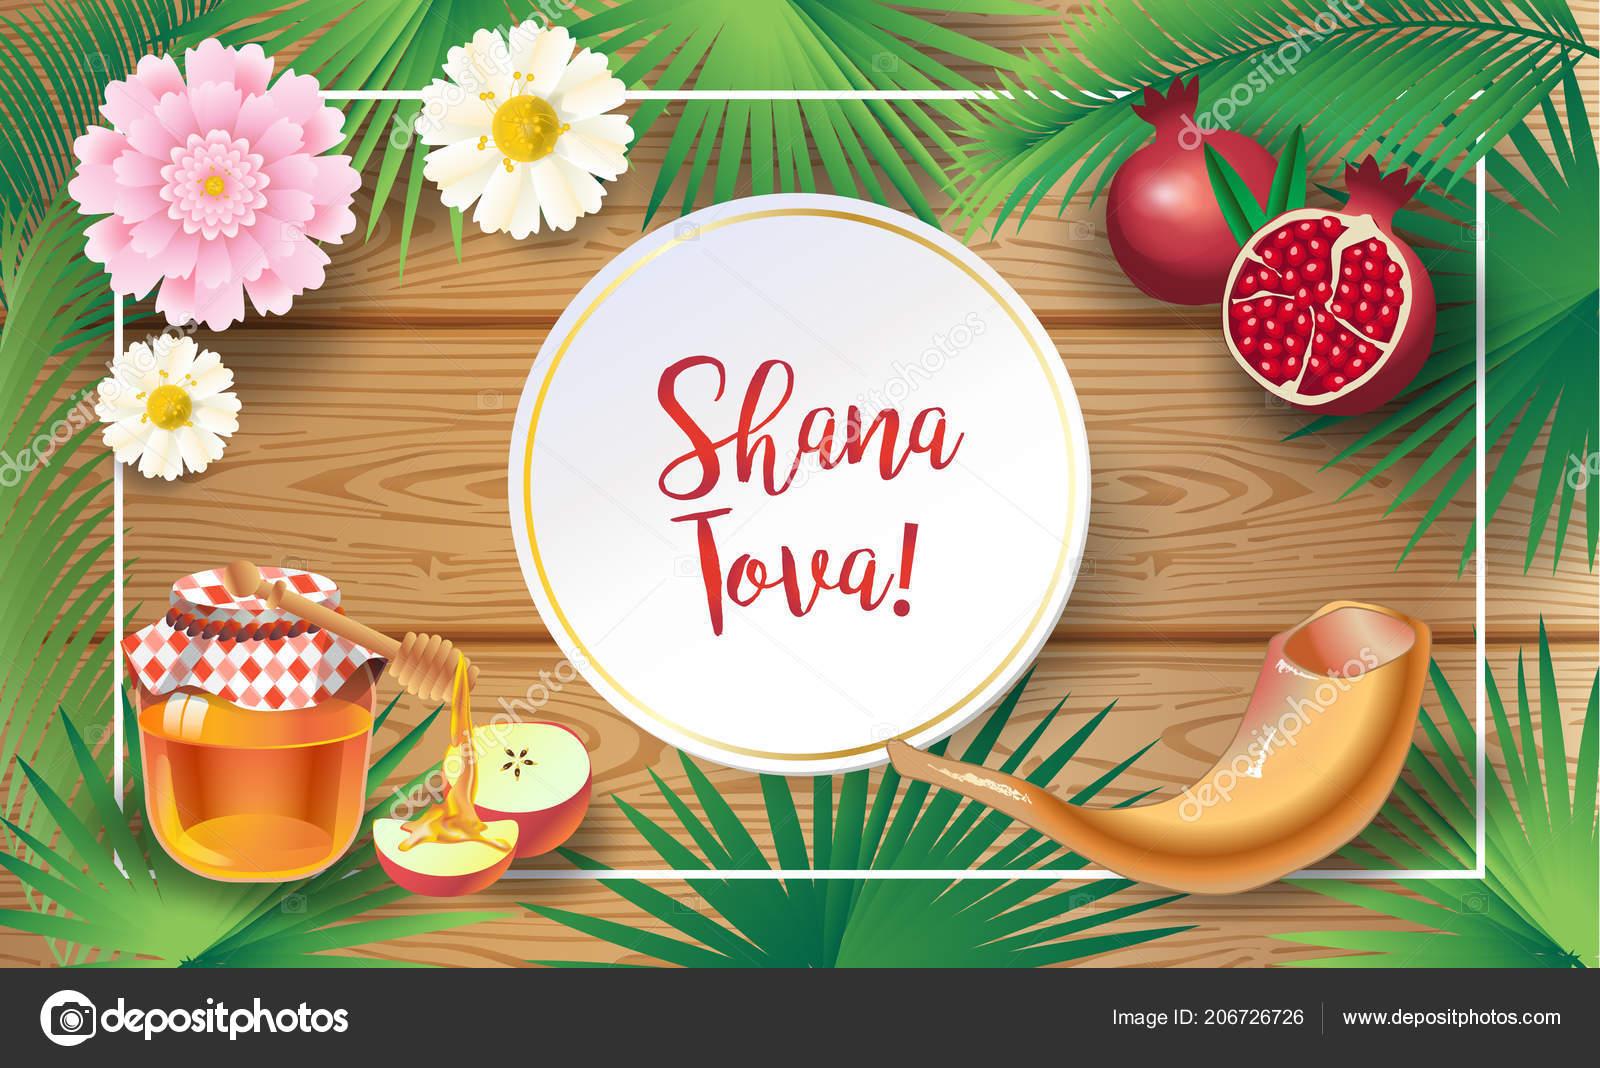 Rosh hashanah greeting card happy jewish new year text shana stock rosh hashanah greeting card happy jewish new year text shana stock vector m4hsunfo